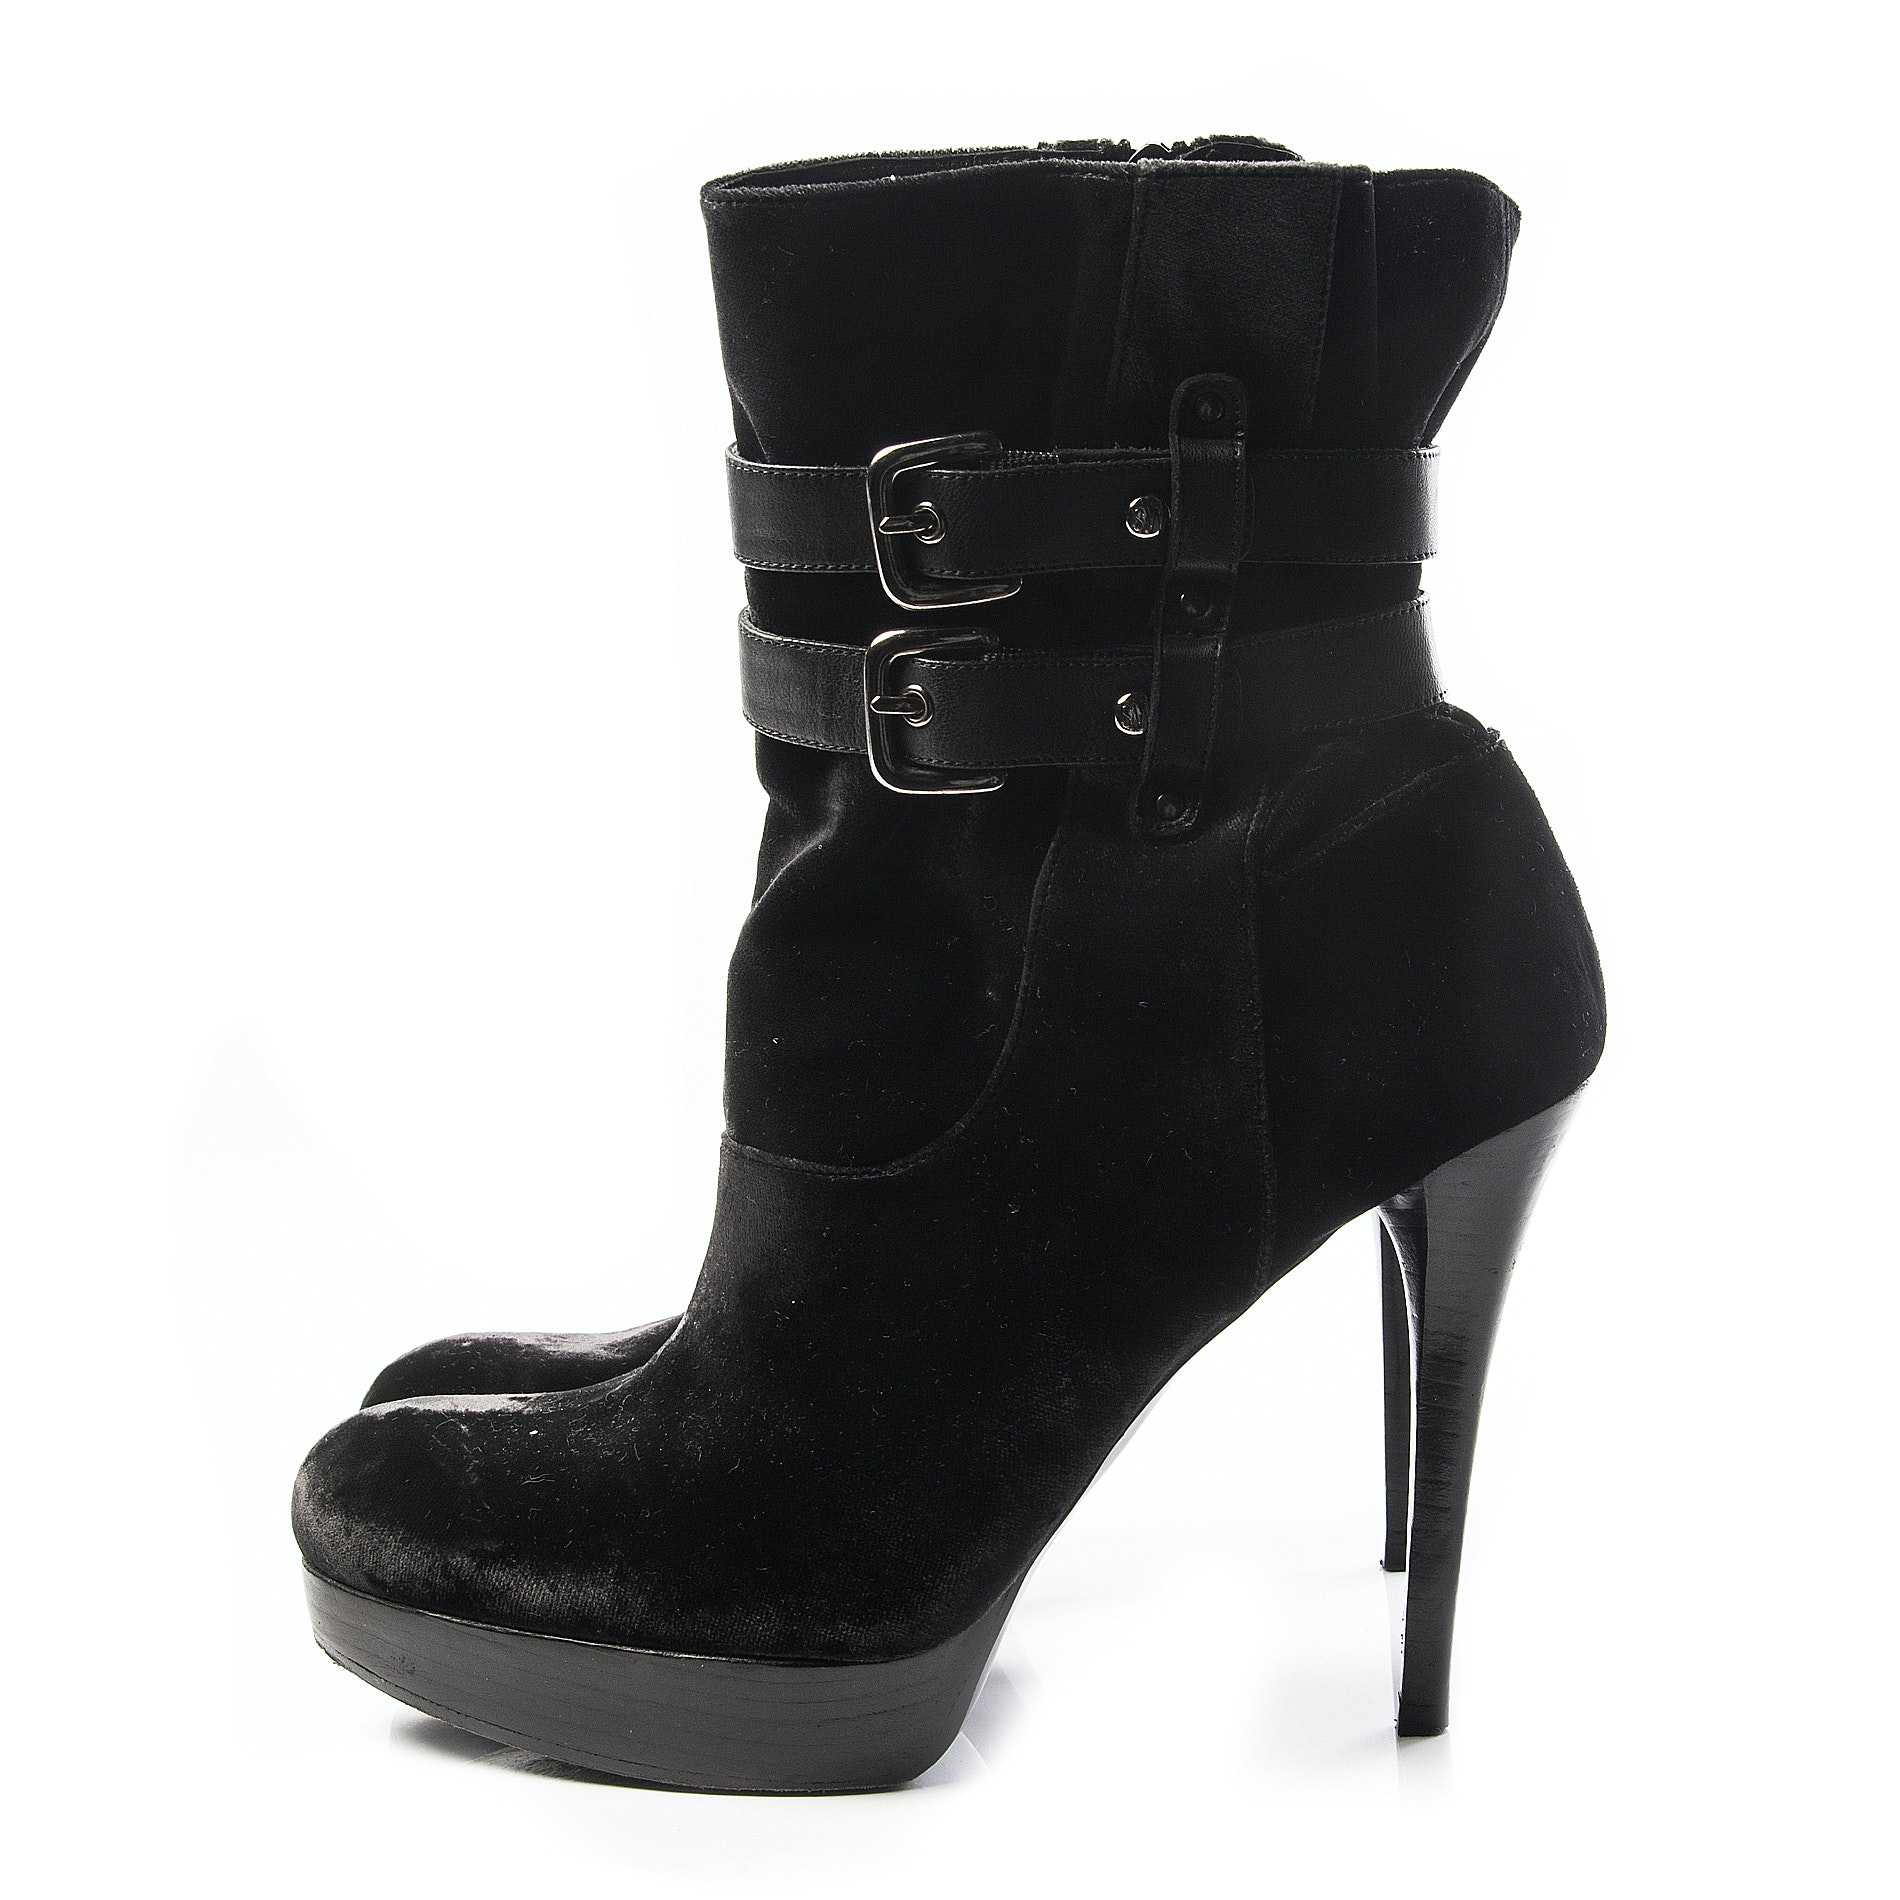 Stuart Weitzman Black Velvet Platform Ankle Boots